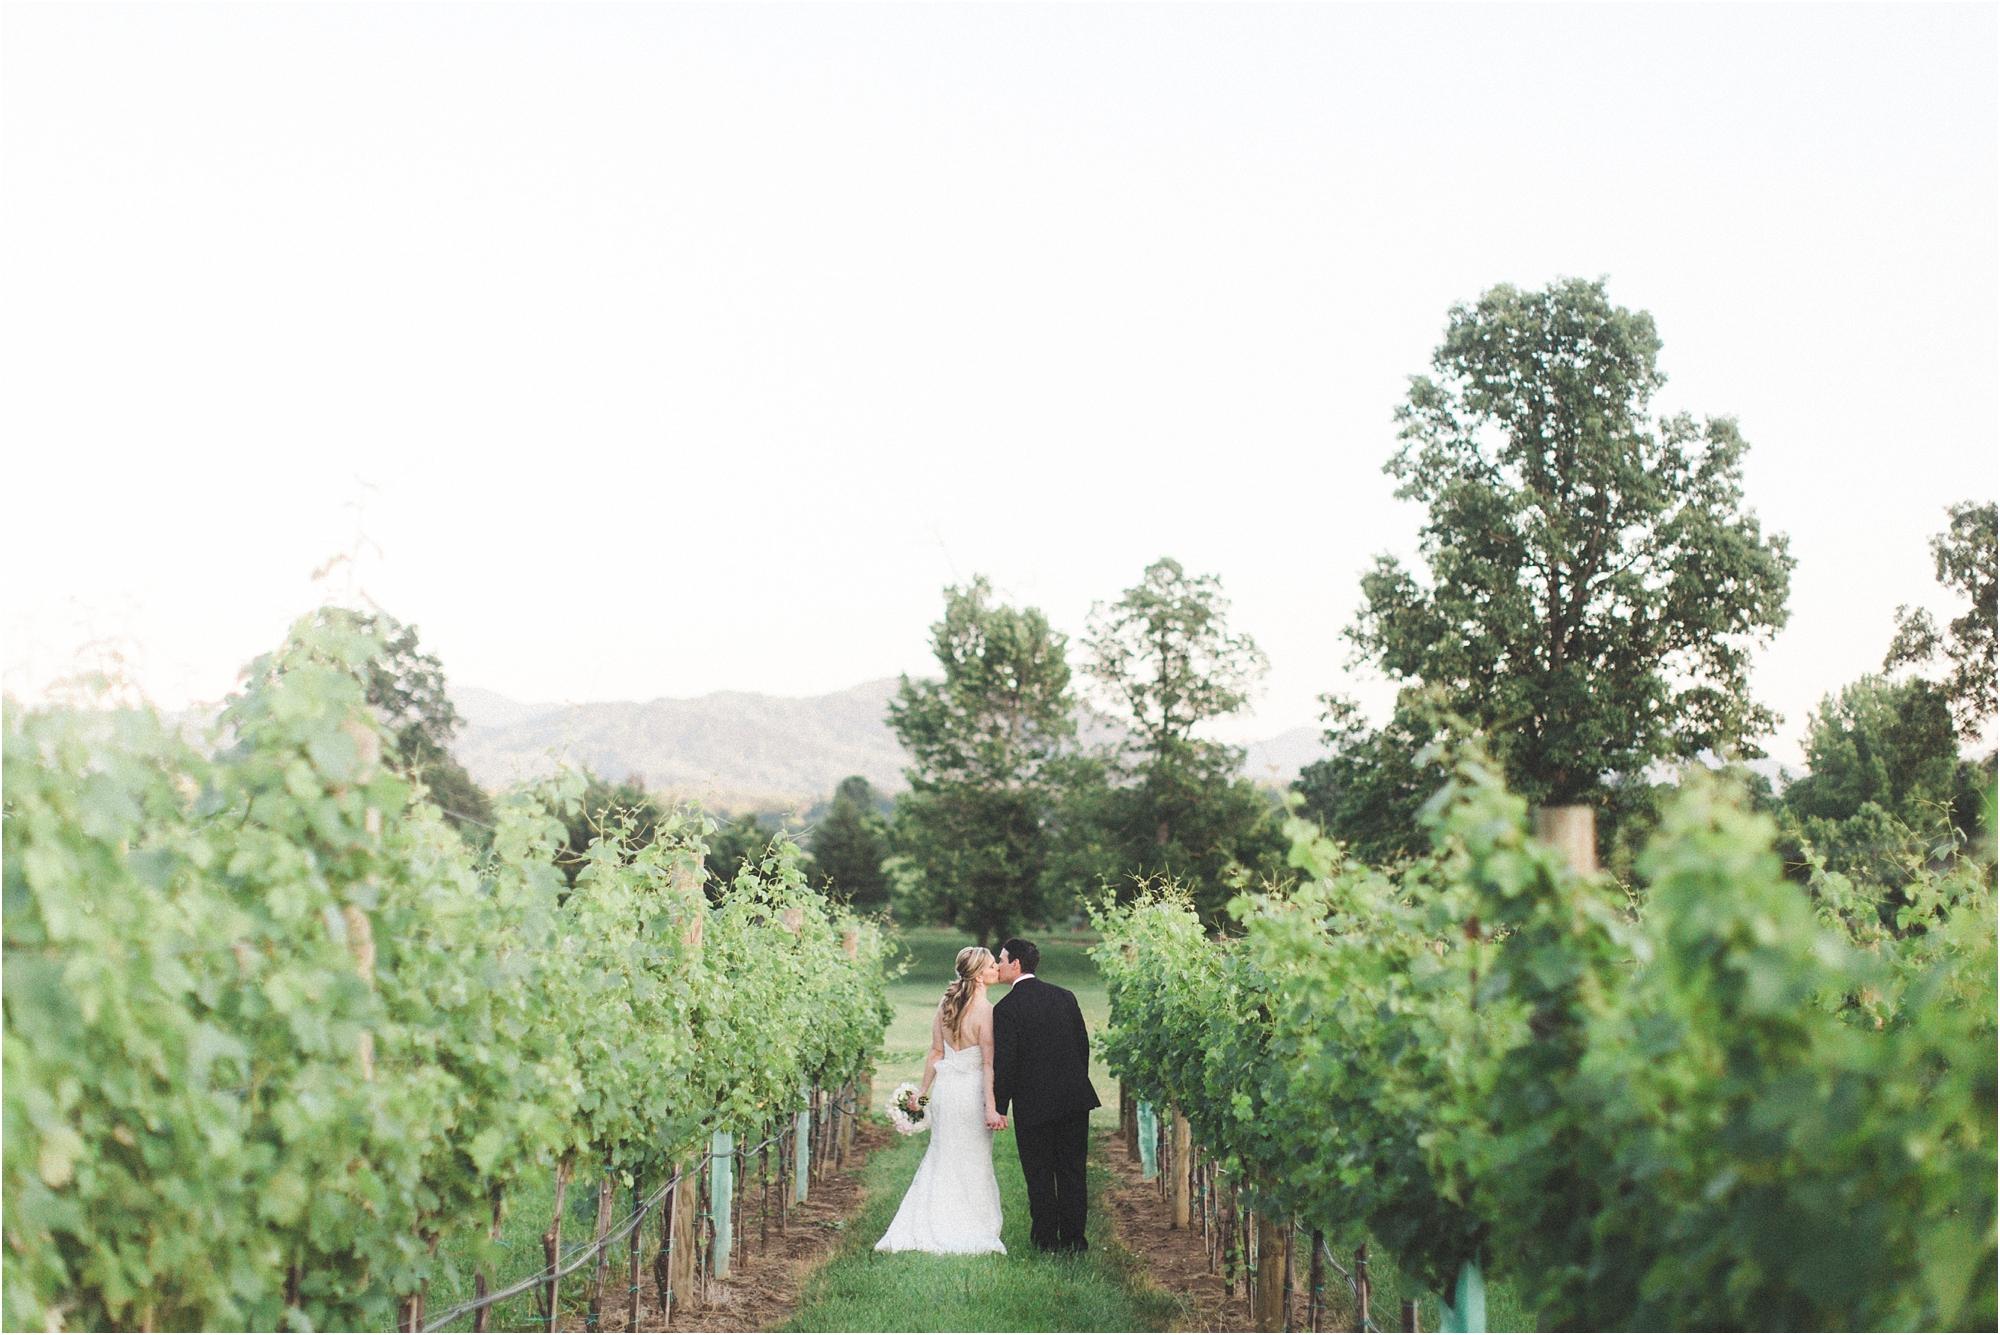 liz-mike-veritas-winery-charlottesville-virginia-wedding-photos_0032.jpg